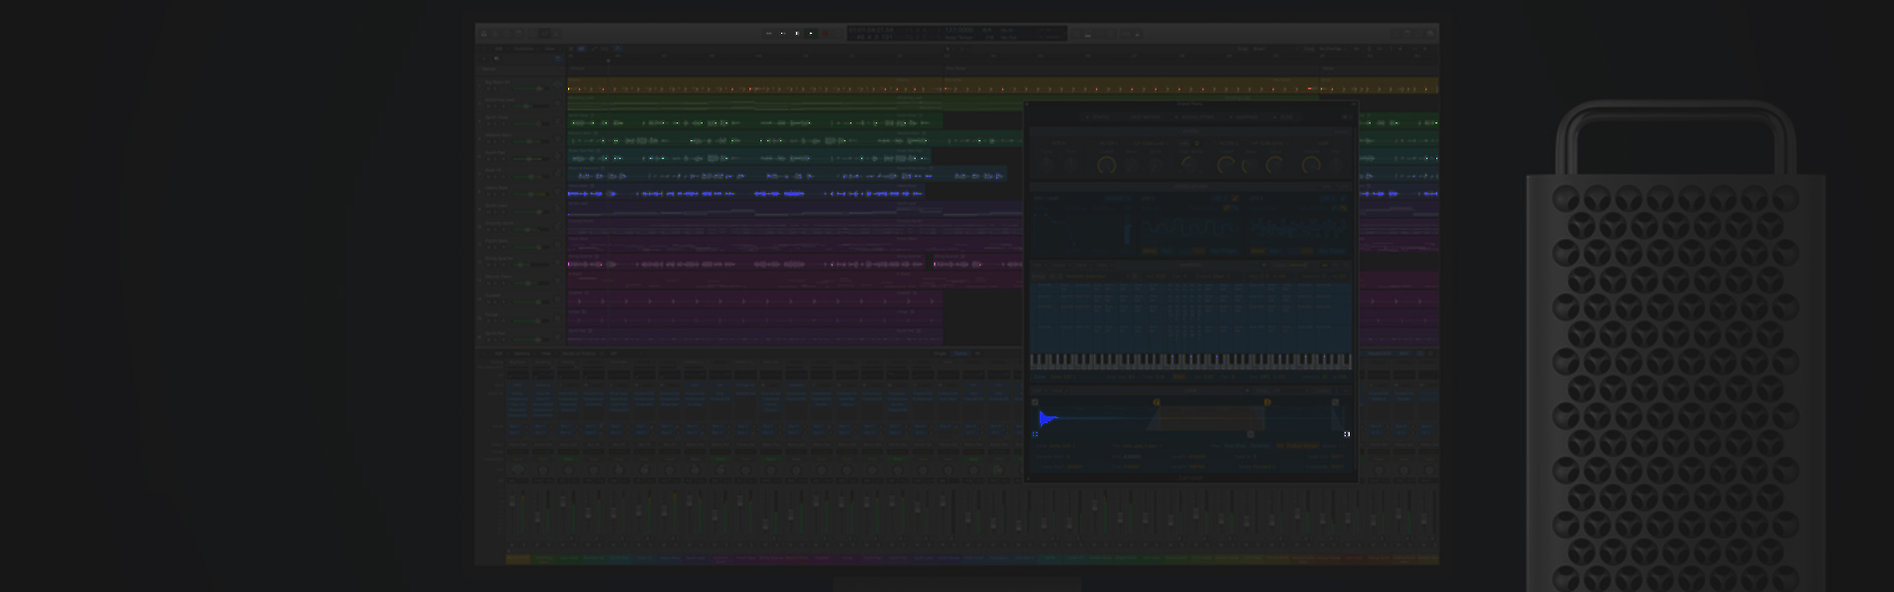 Logic Pro X Cover 1.jpg